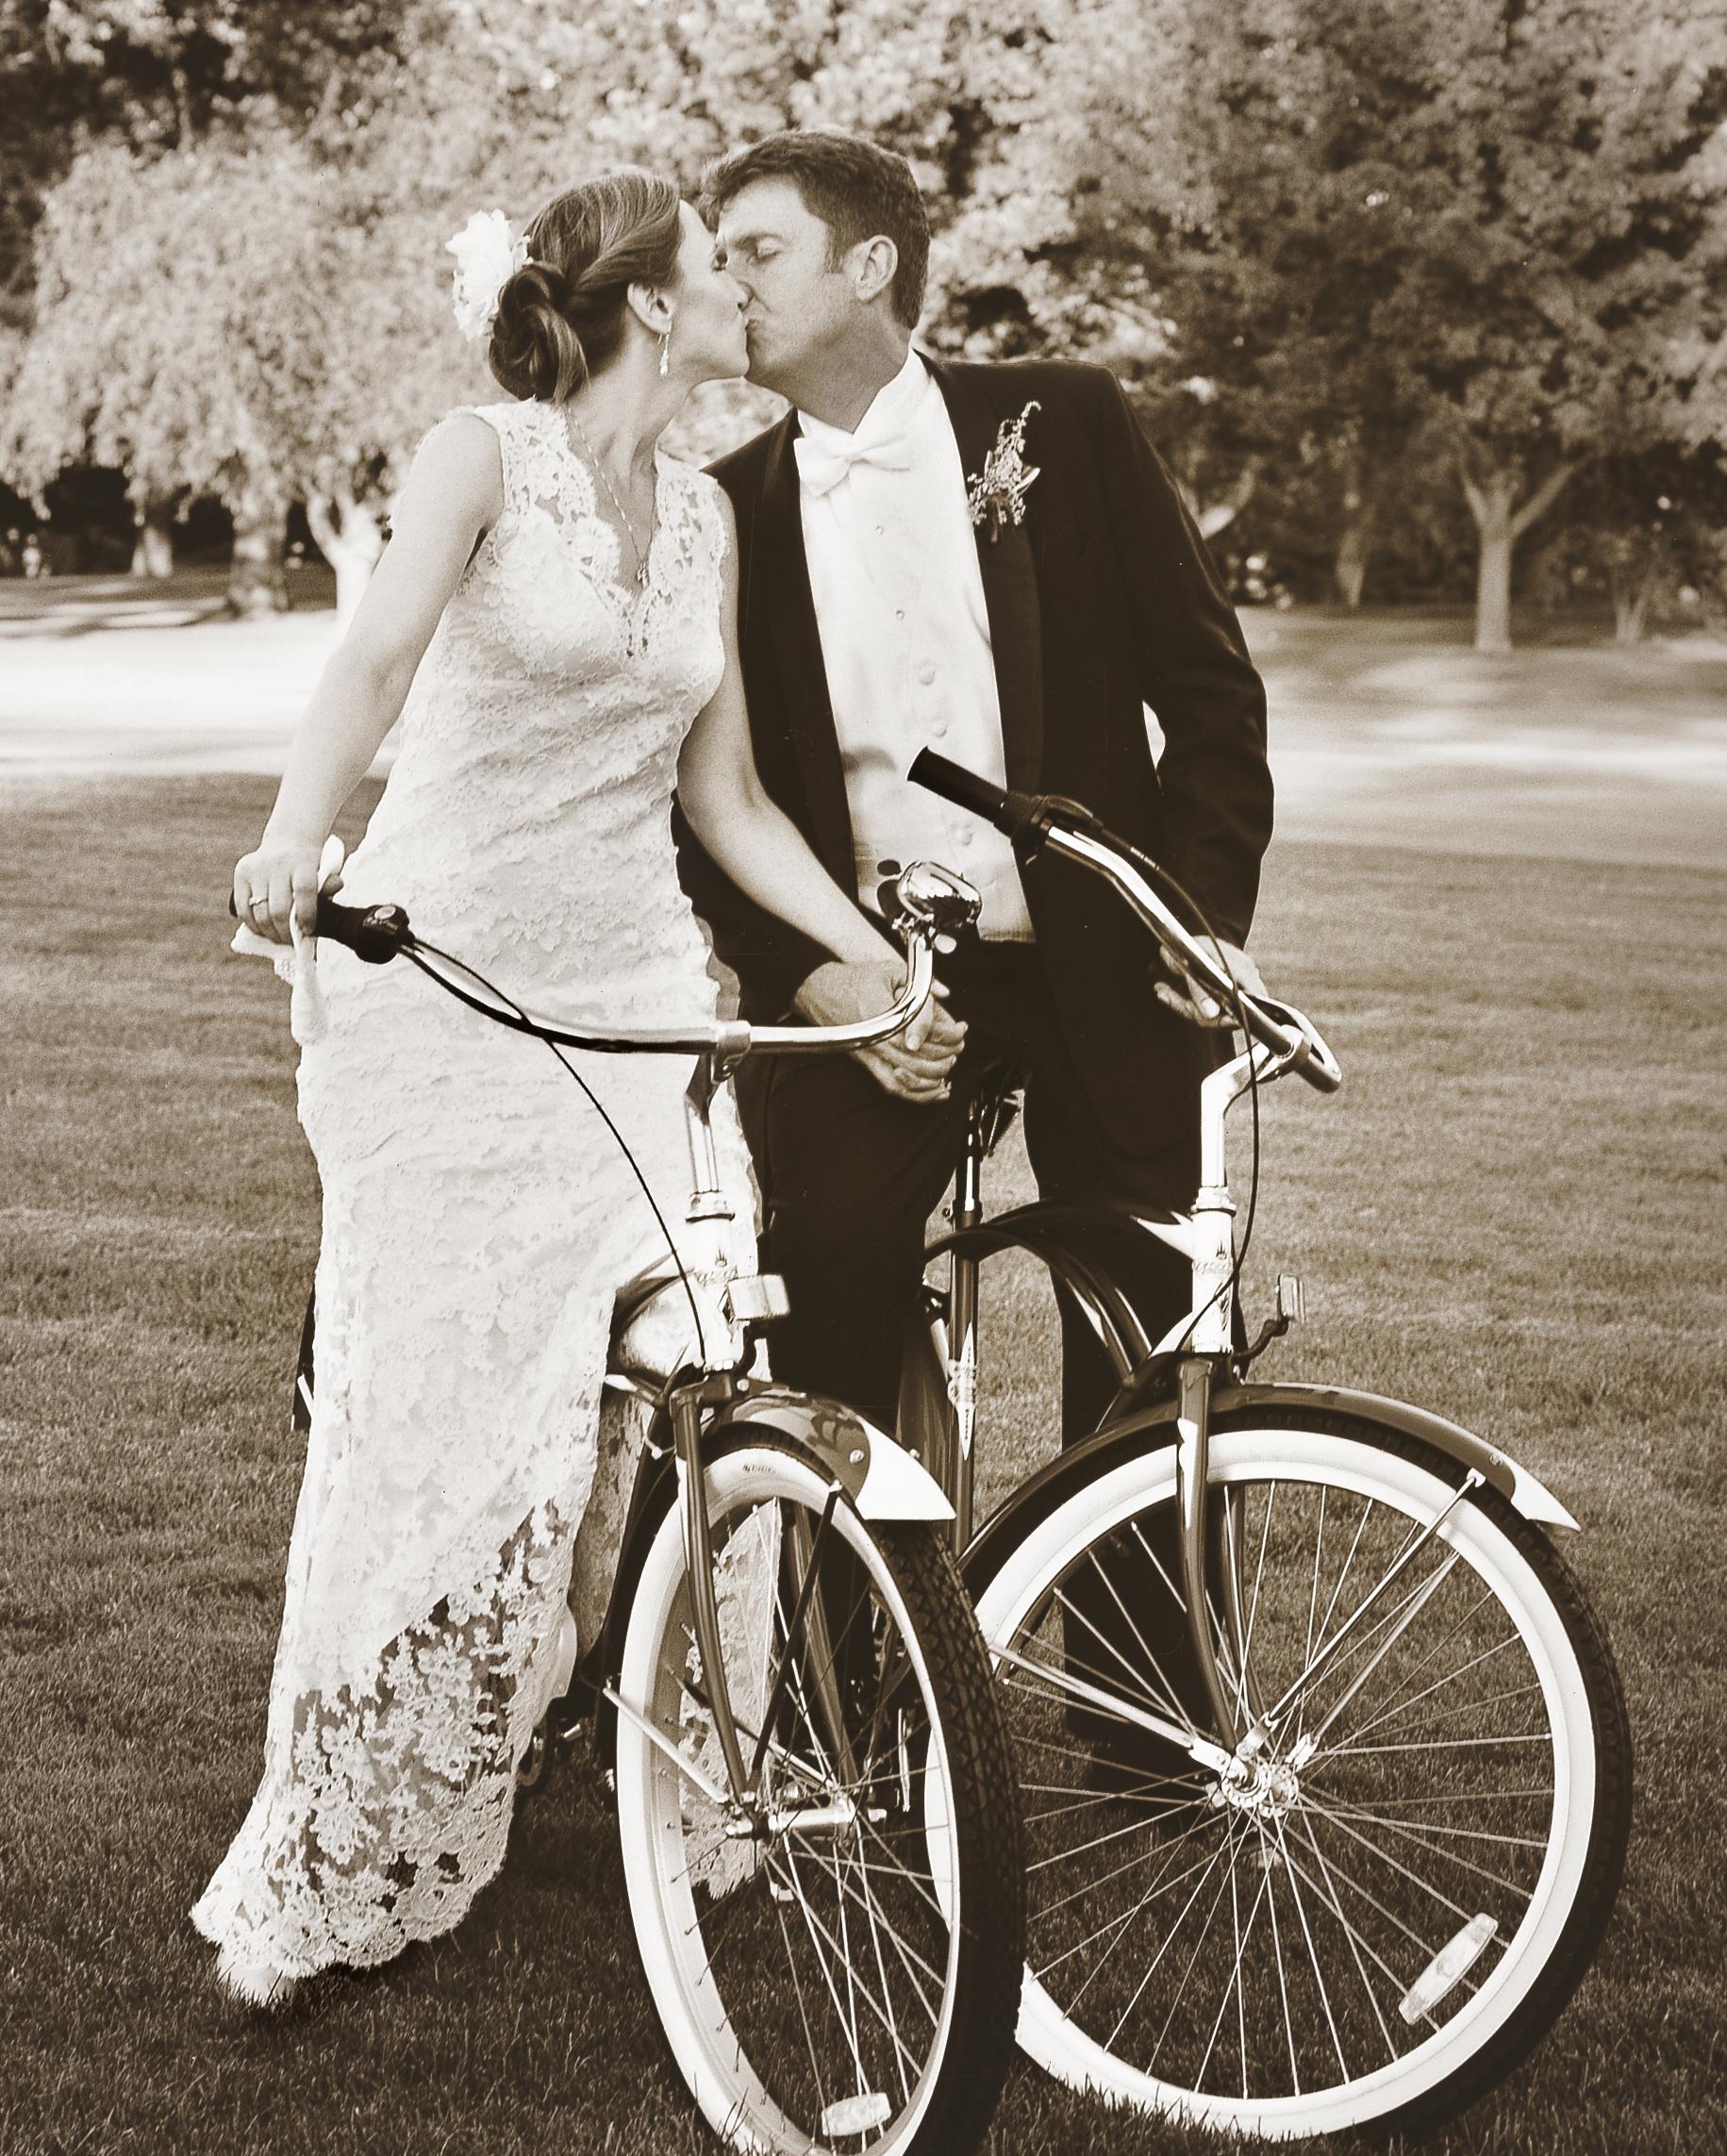 couple-kissing-bicycles-mw1204rwdb11-bw.jpg